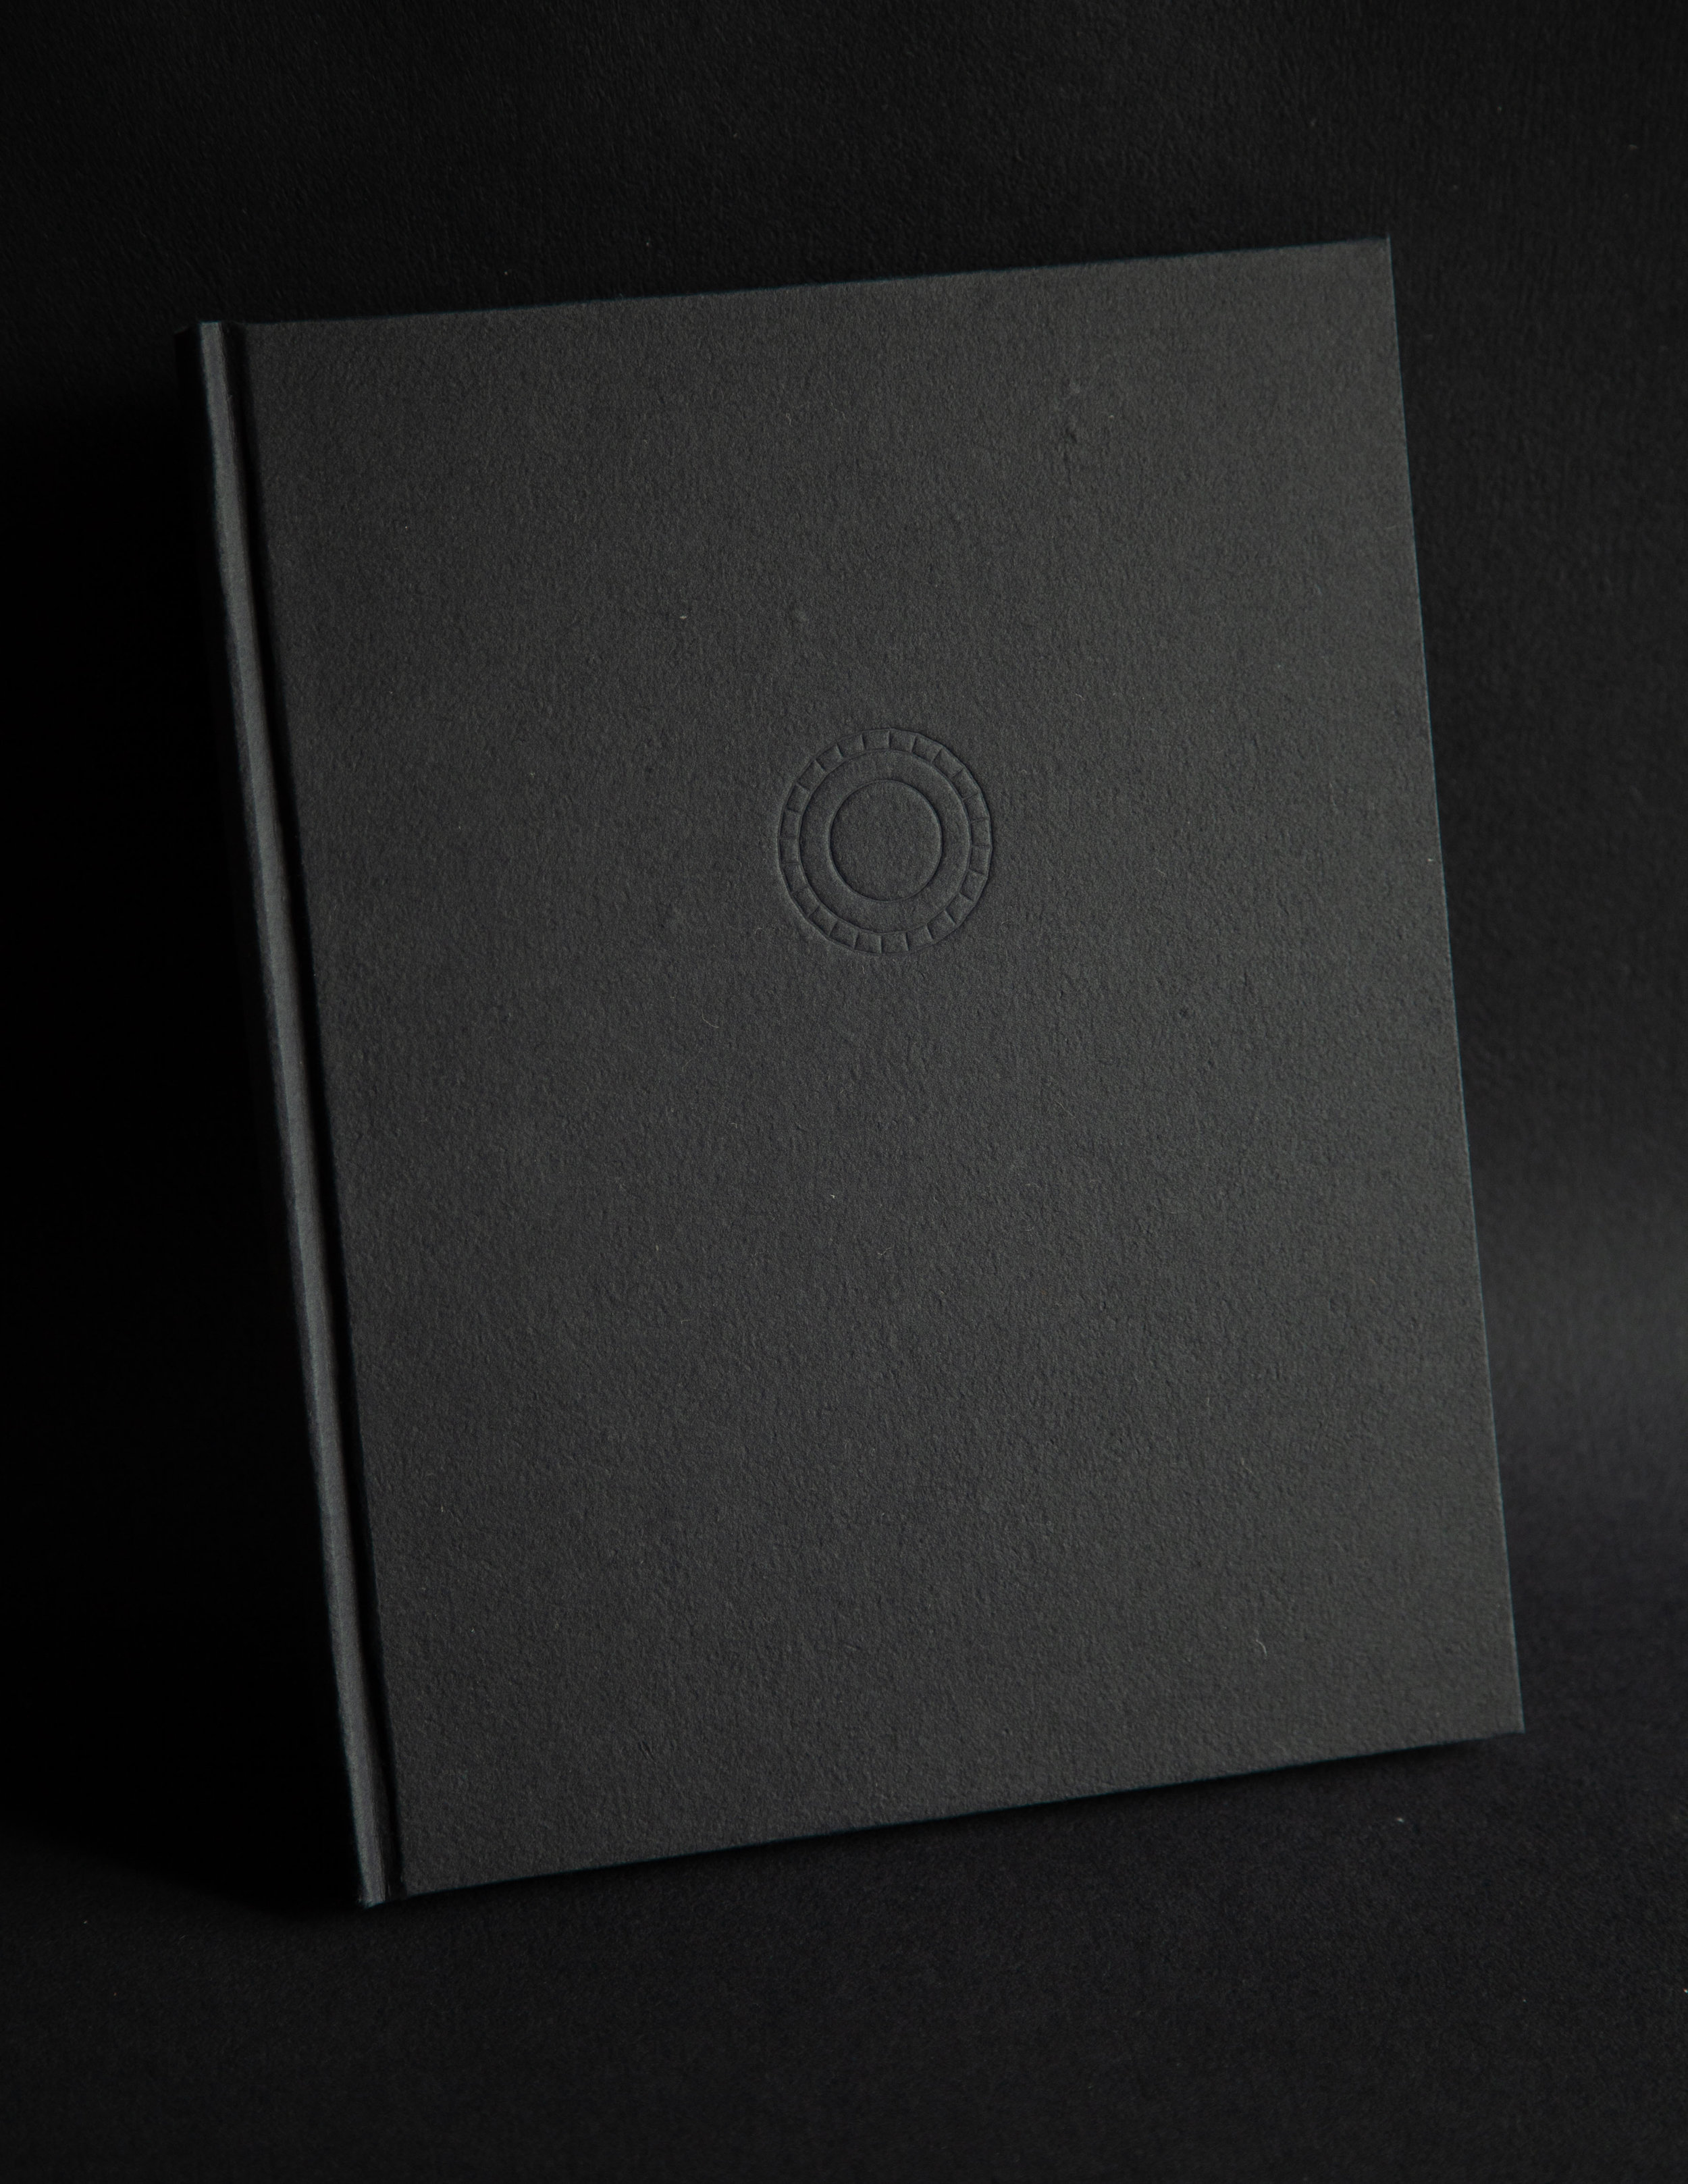 Folly Artist Book